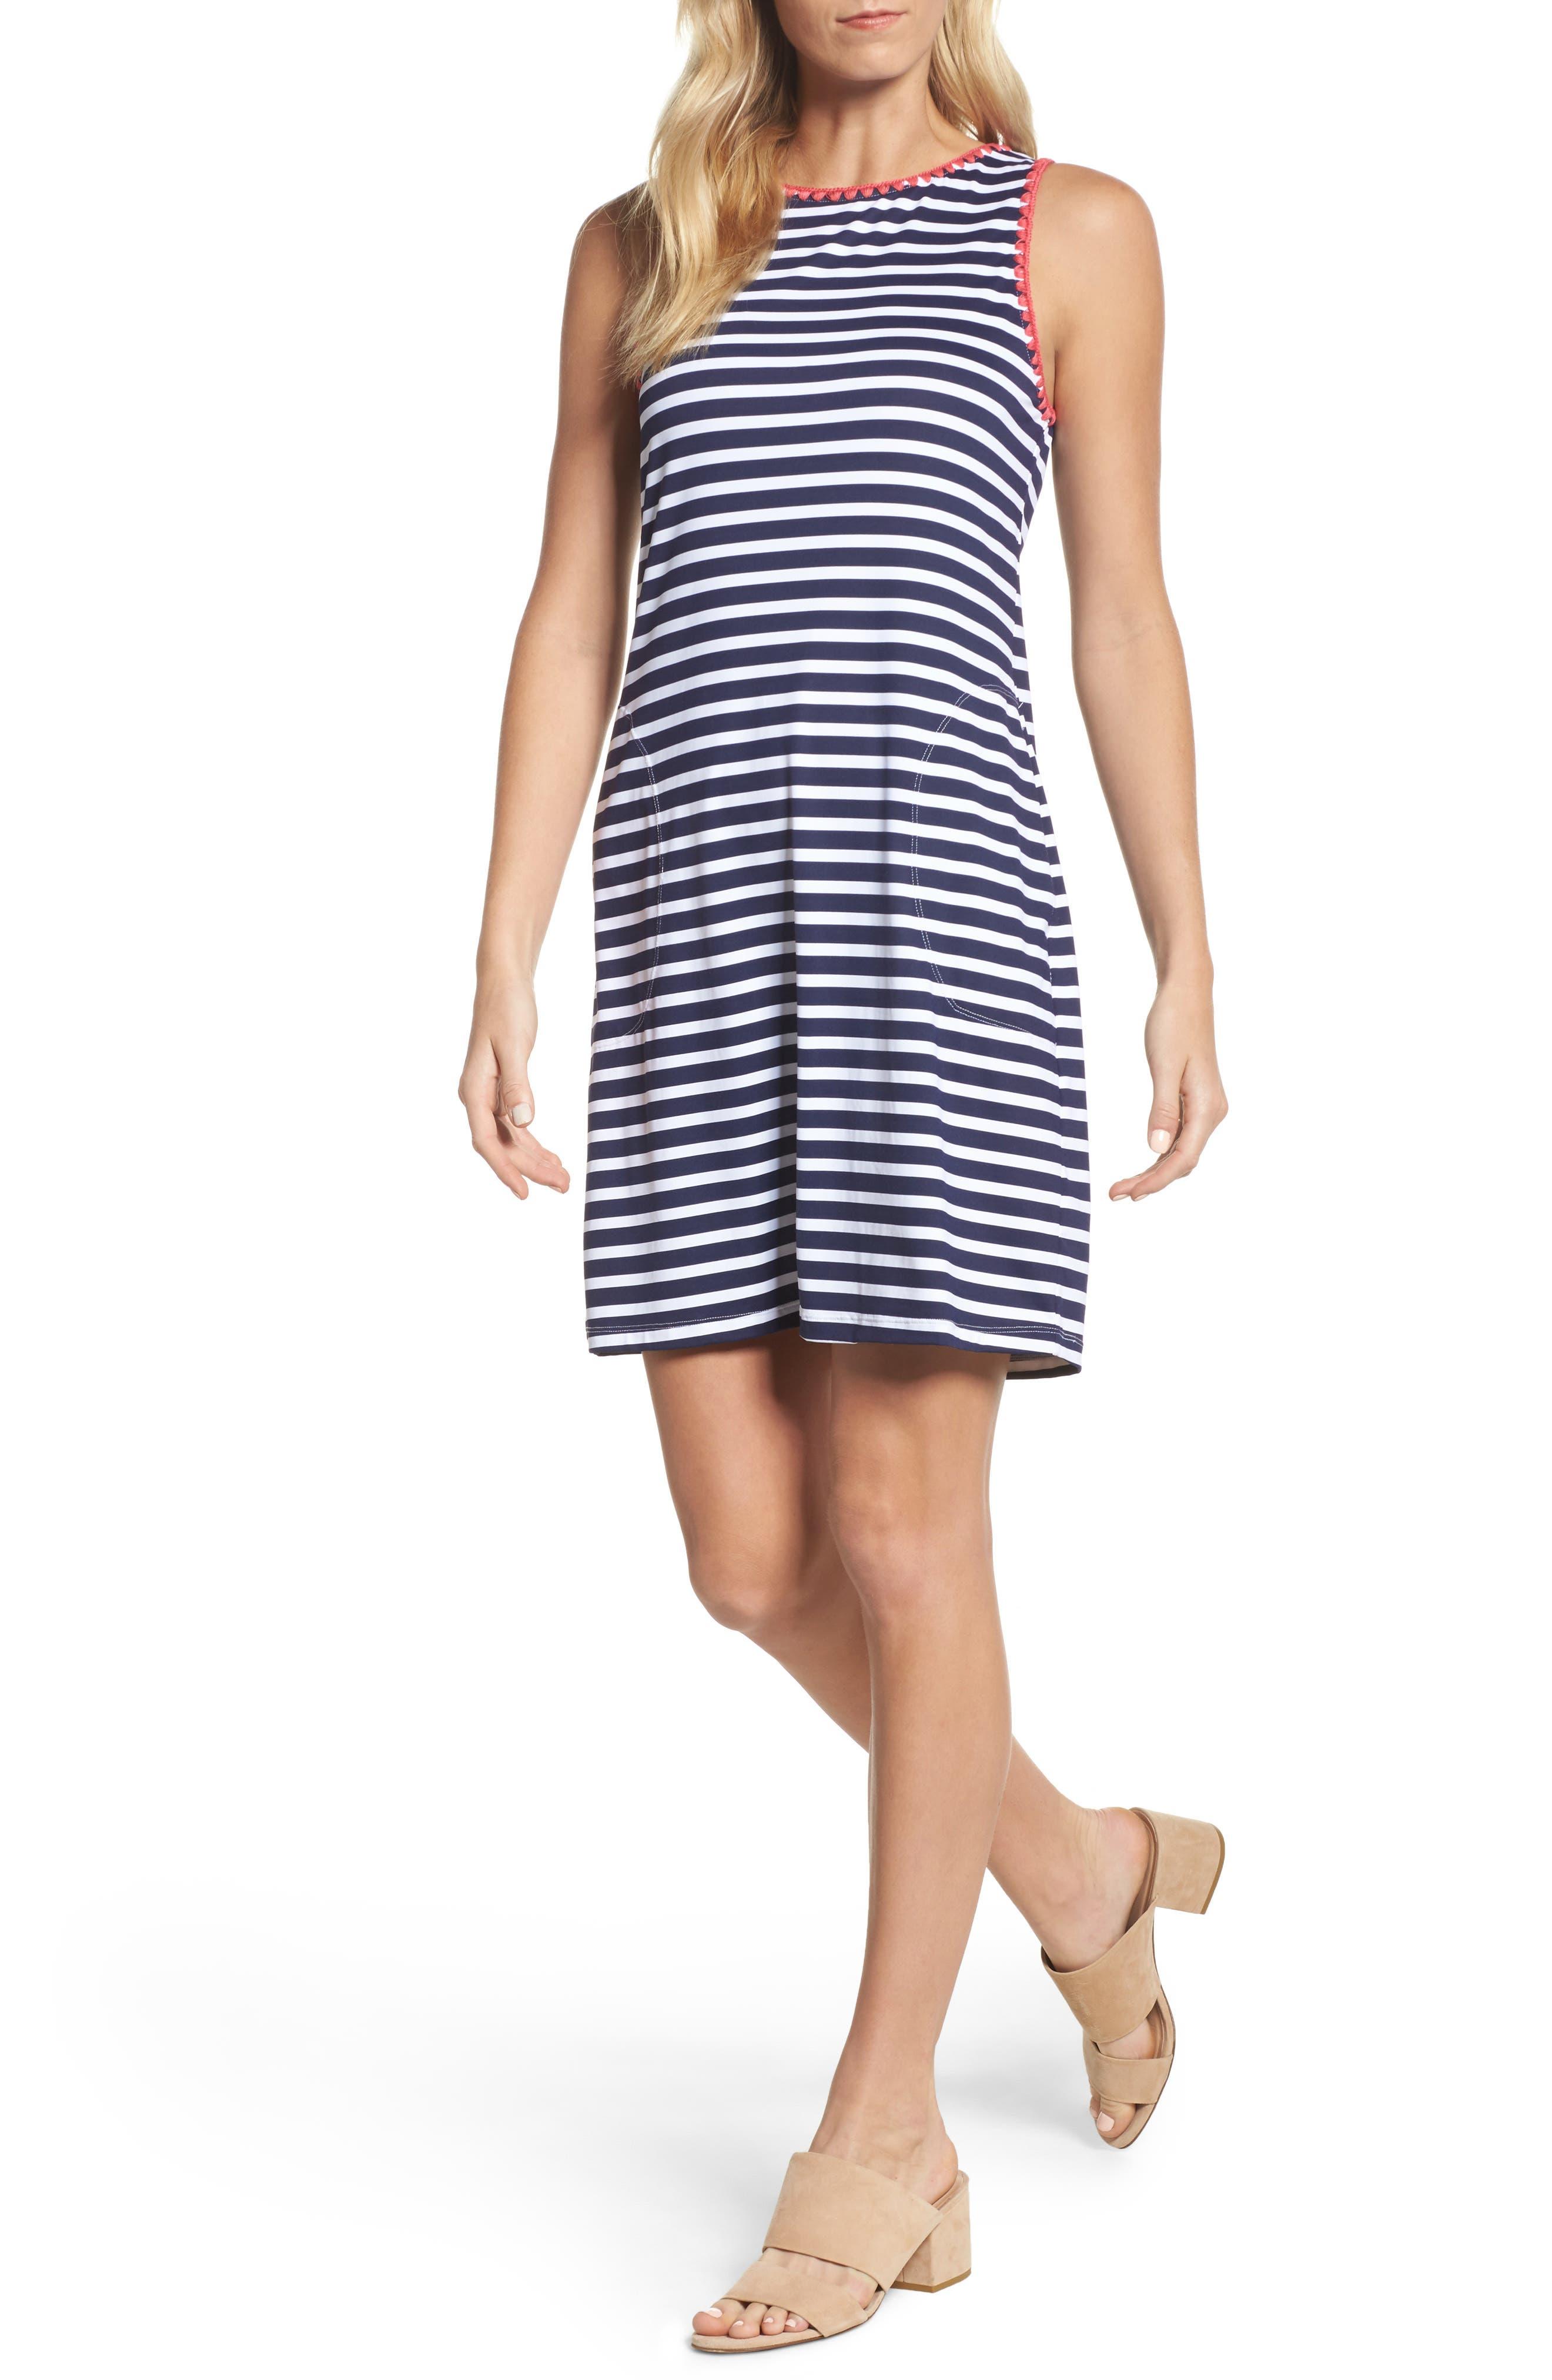 Breton Stripe Cover-Up Dress,                         Main,                         color, Mare Navy/ White